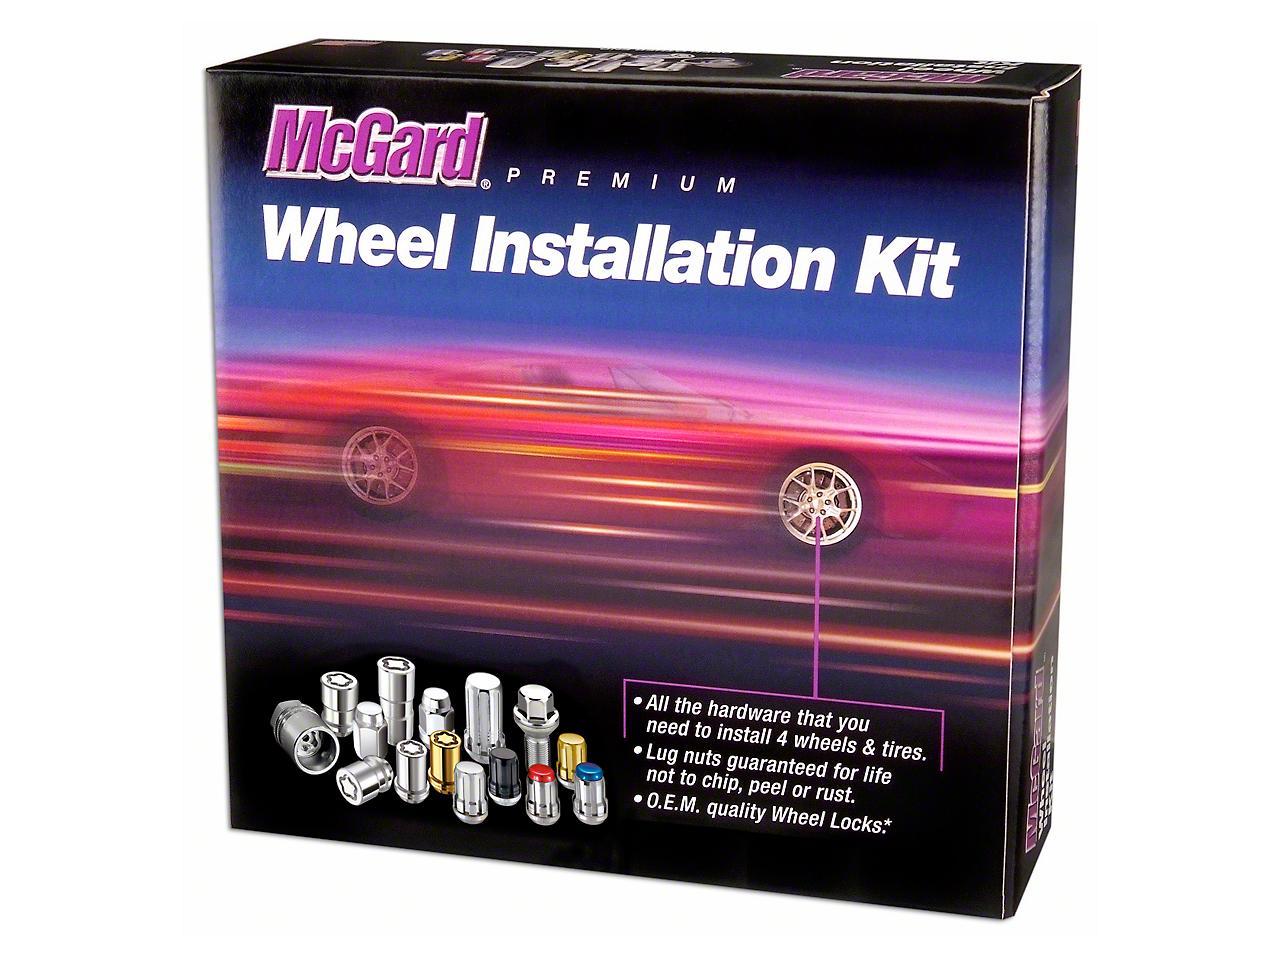 McGard Gold SplineDrive 6-Lug Wheel Installation Kit - 14mm x 1.5 in. (99-18 Silverado 1500)